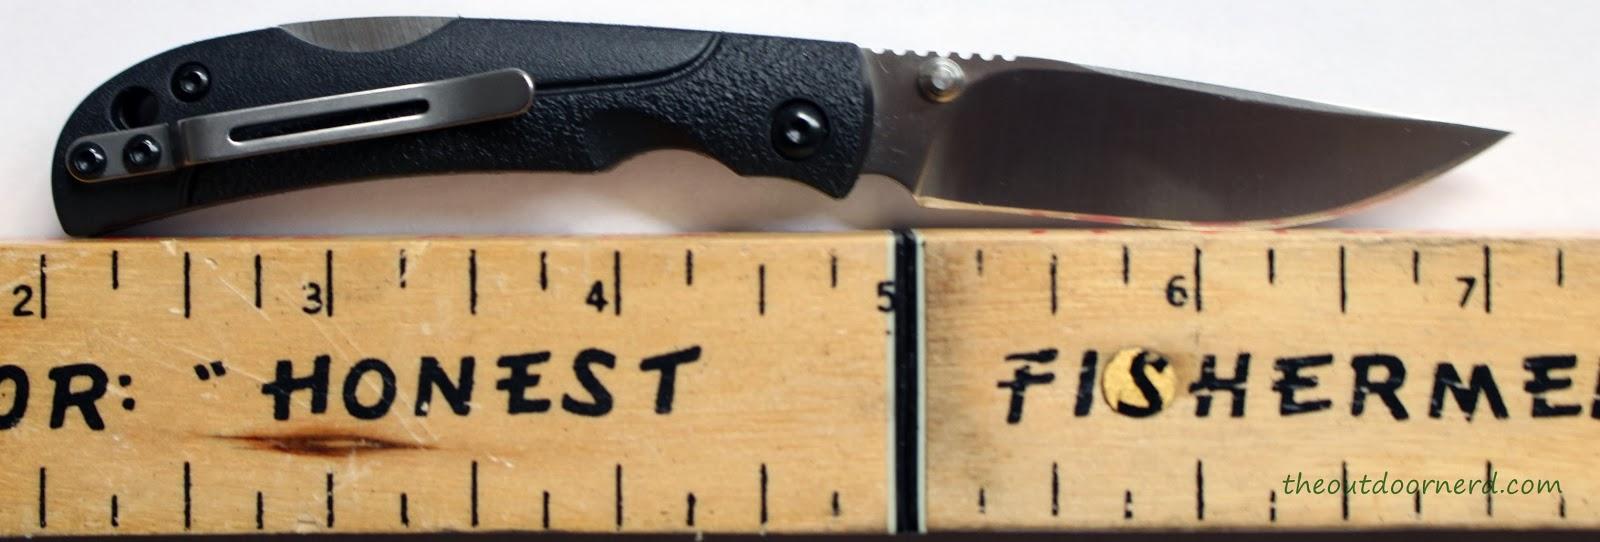 SanRenMu ZB-681 Pocket Knife - Next To Ruler